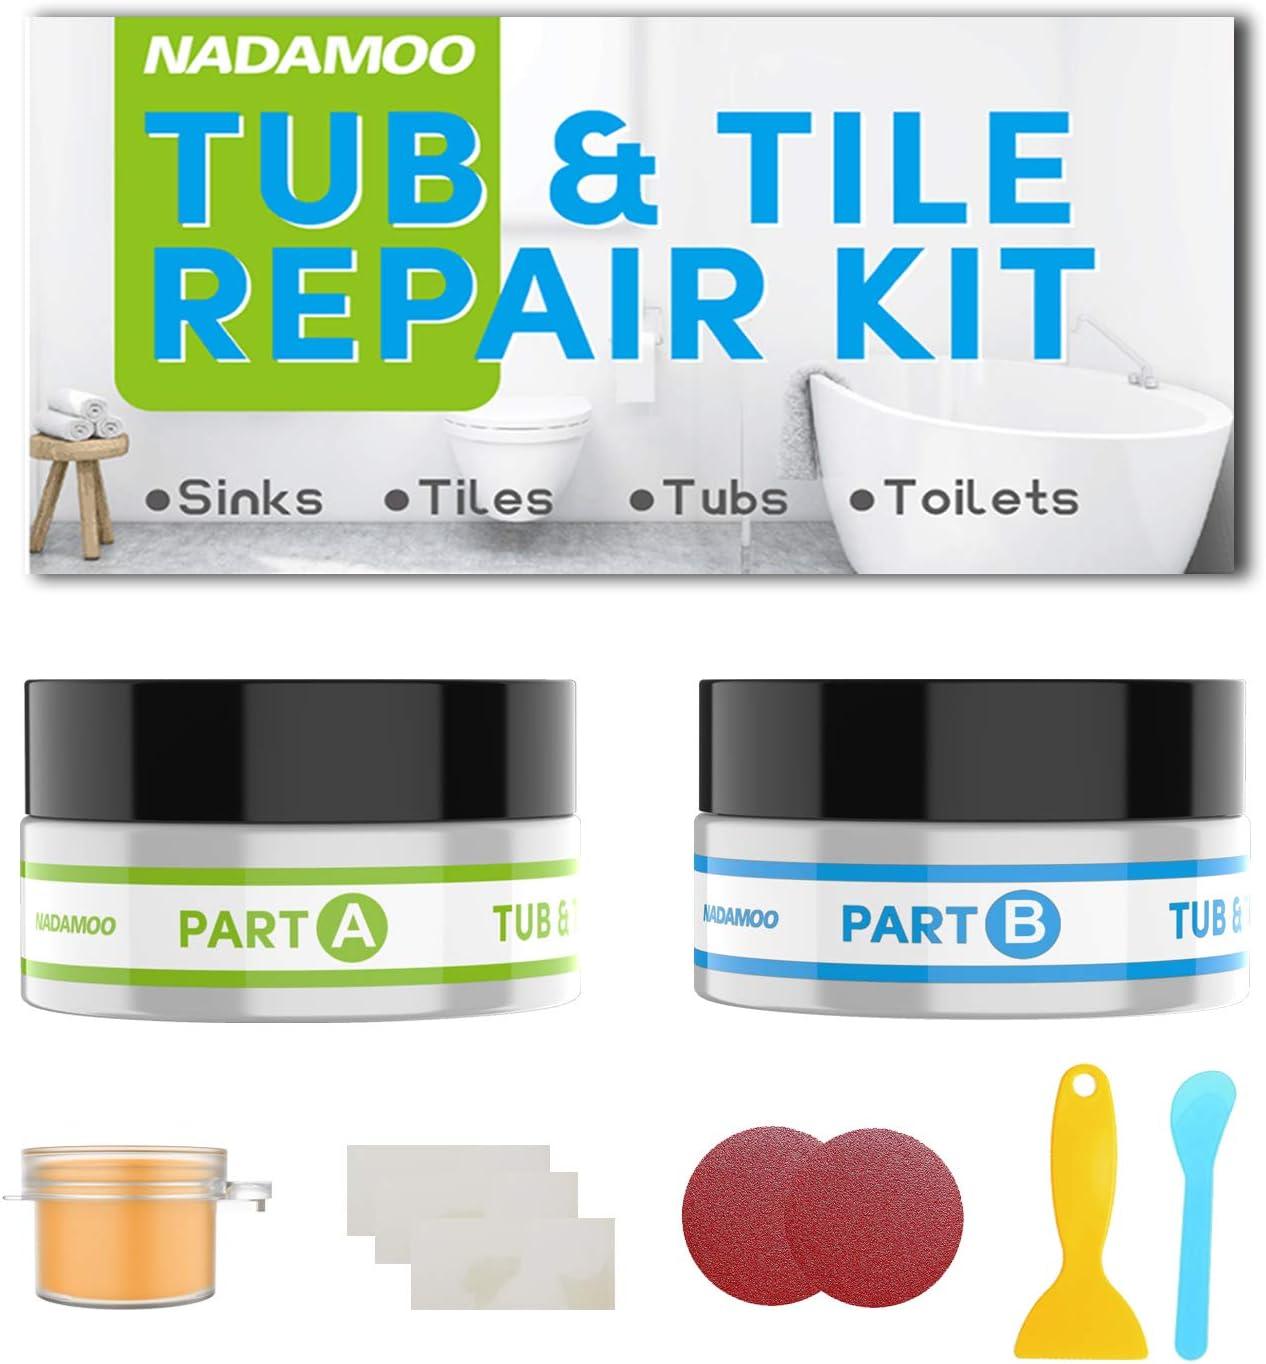 NADAMOO Tub Repair Kit Tile Shower Repair Kit for Fiberglass Porcelain Ceramic Acrylic Stone Fix Crack Chip Scrap Drill Hole Adhesive Sealant Ivory White Beige Almond - 3.5 Oz